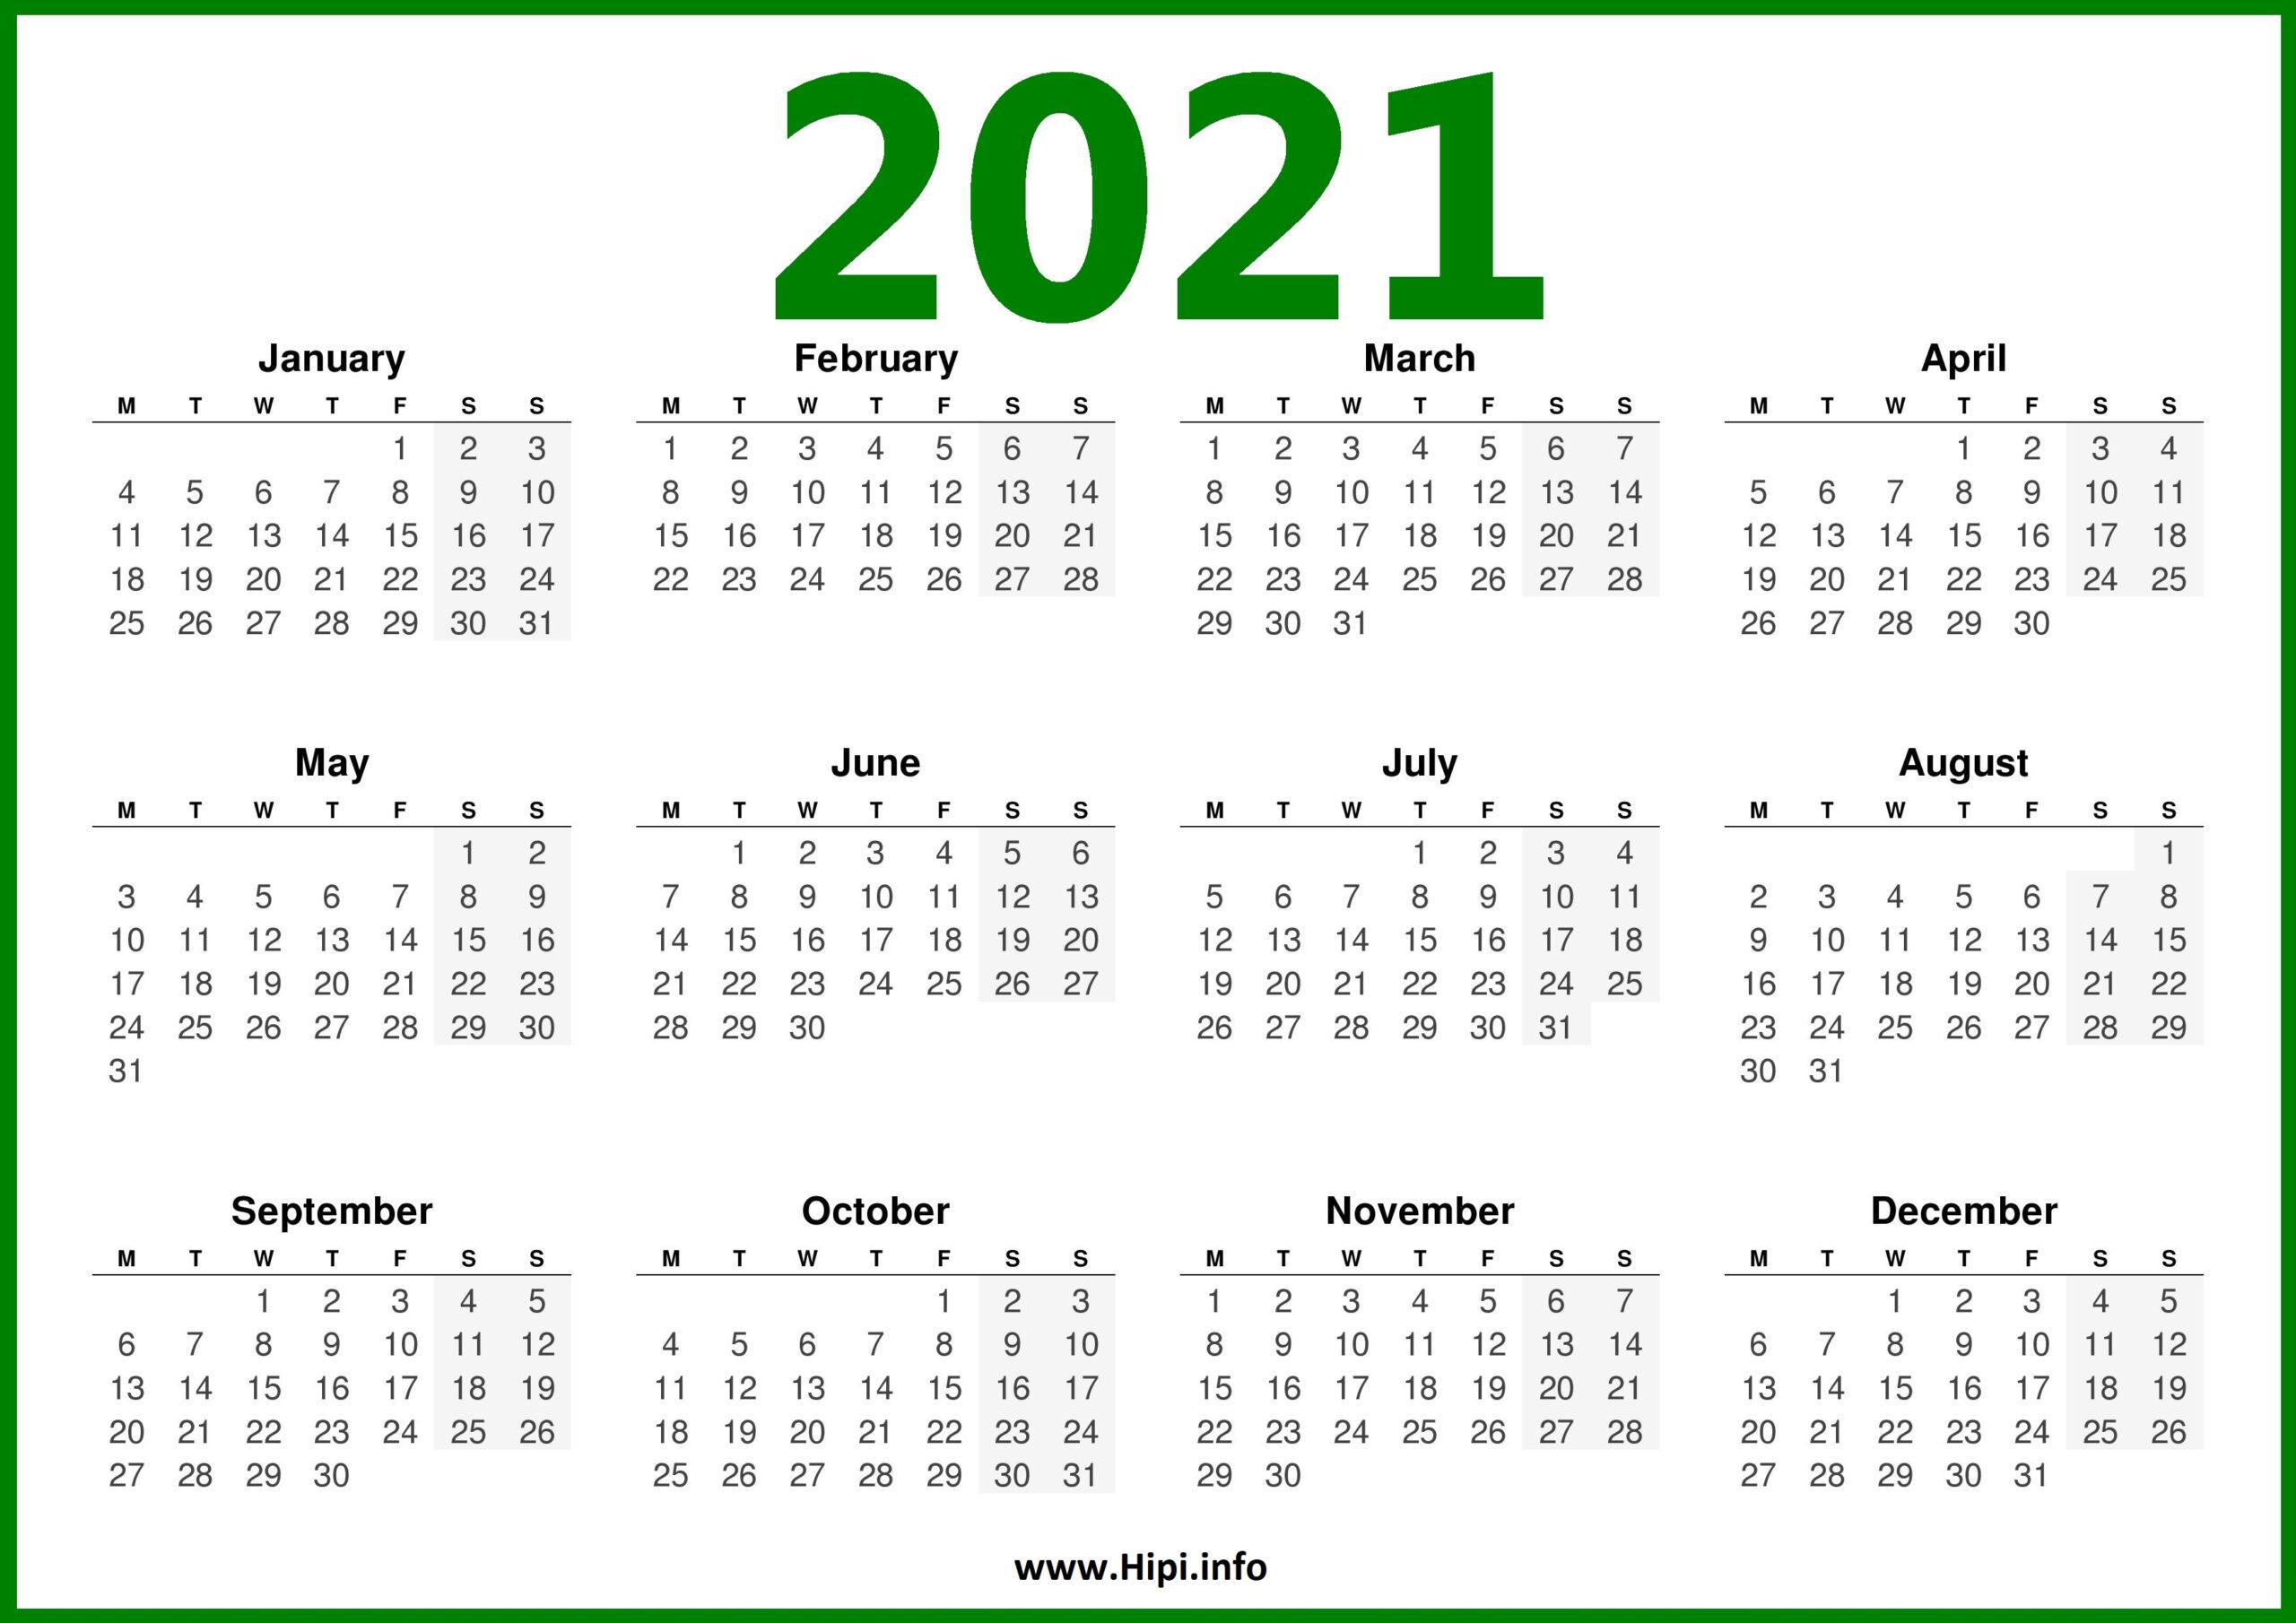 2021 Calendar Uk - Monday Start - Hipi